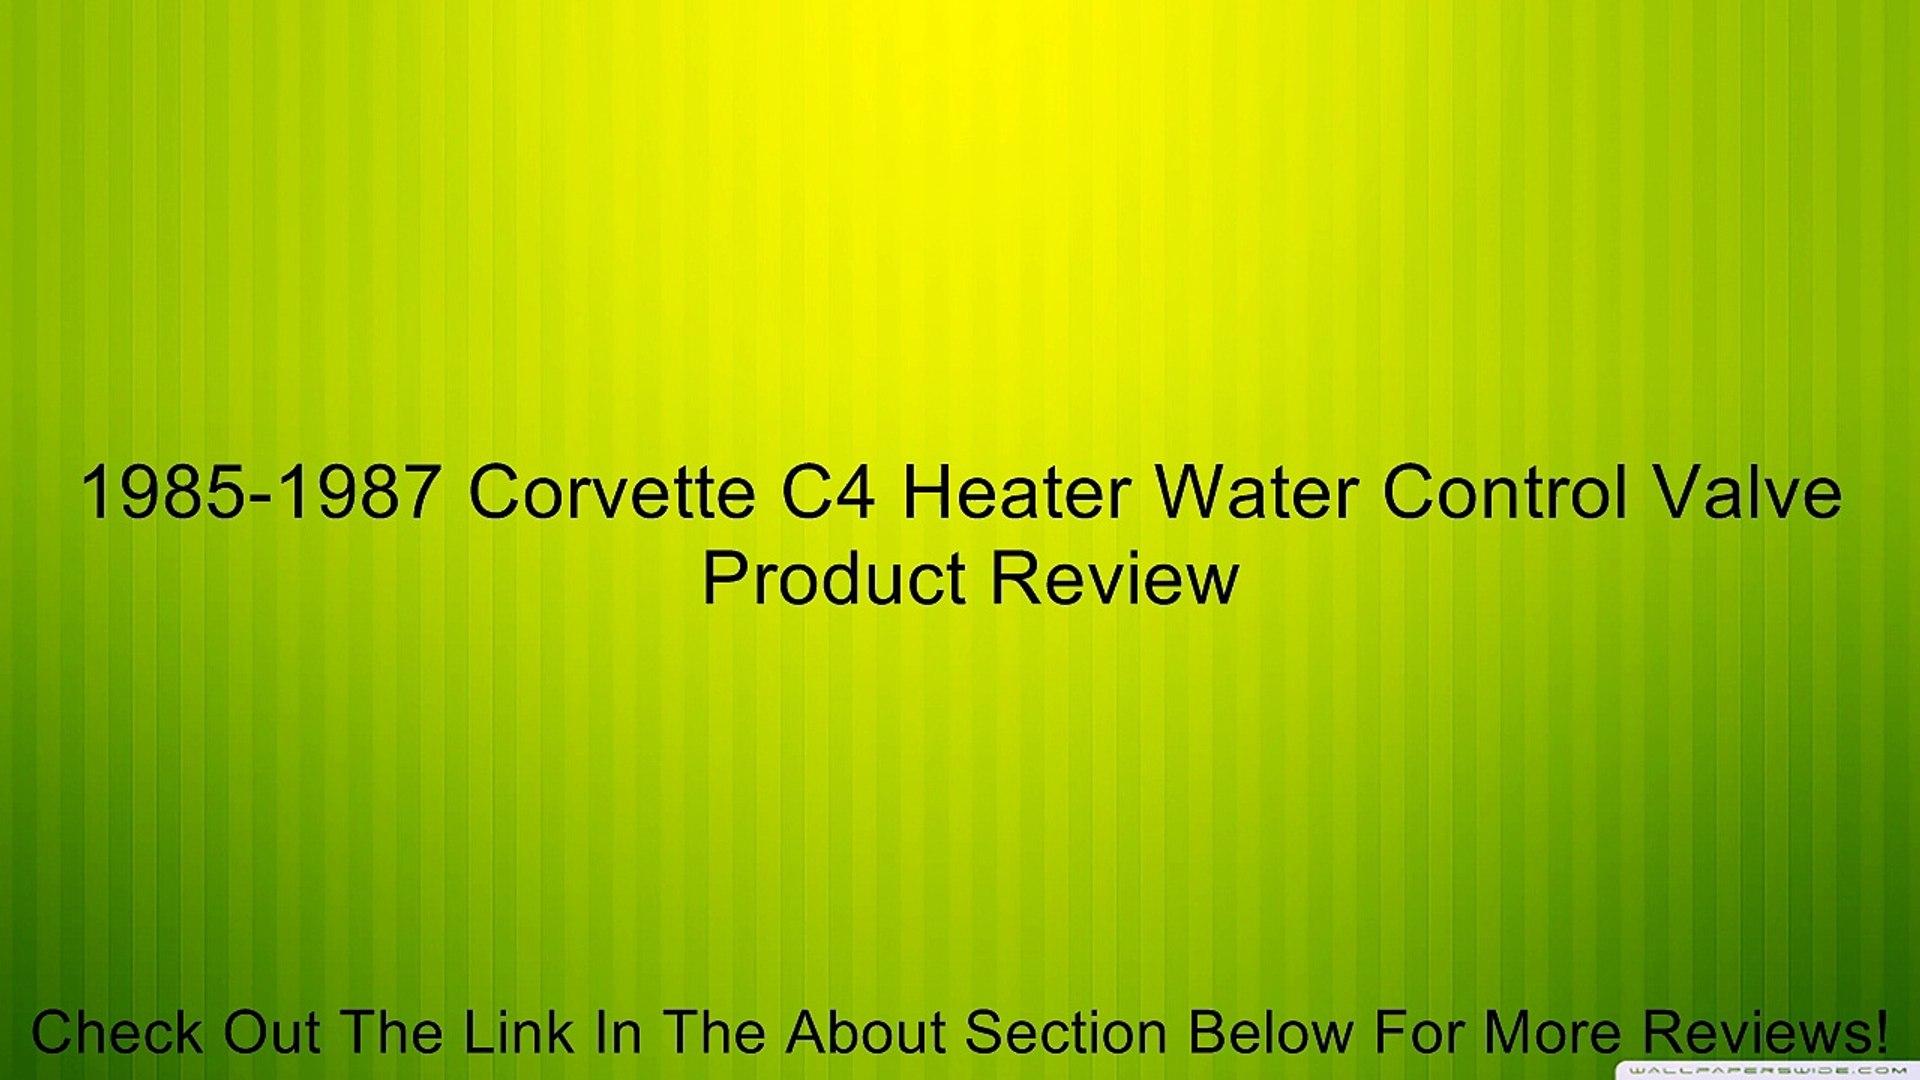 1985-1987 Corvette C4 Heater Water Control Valve